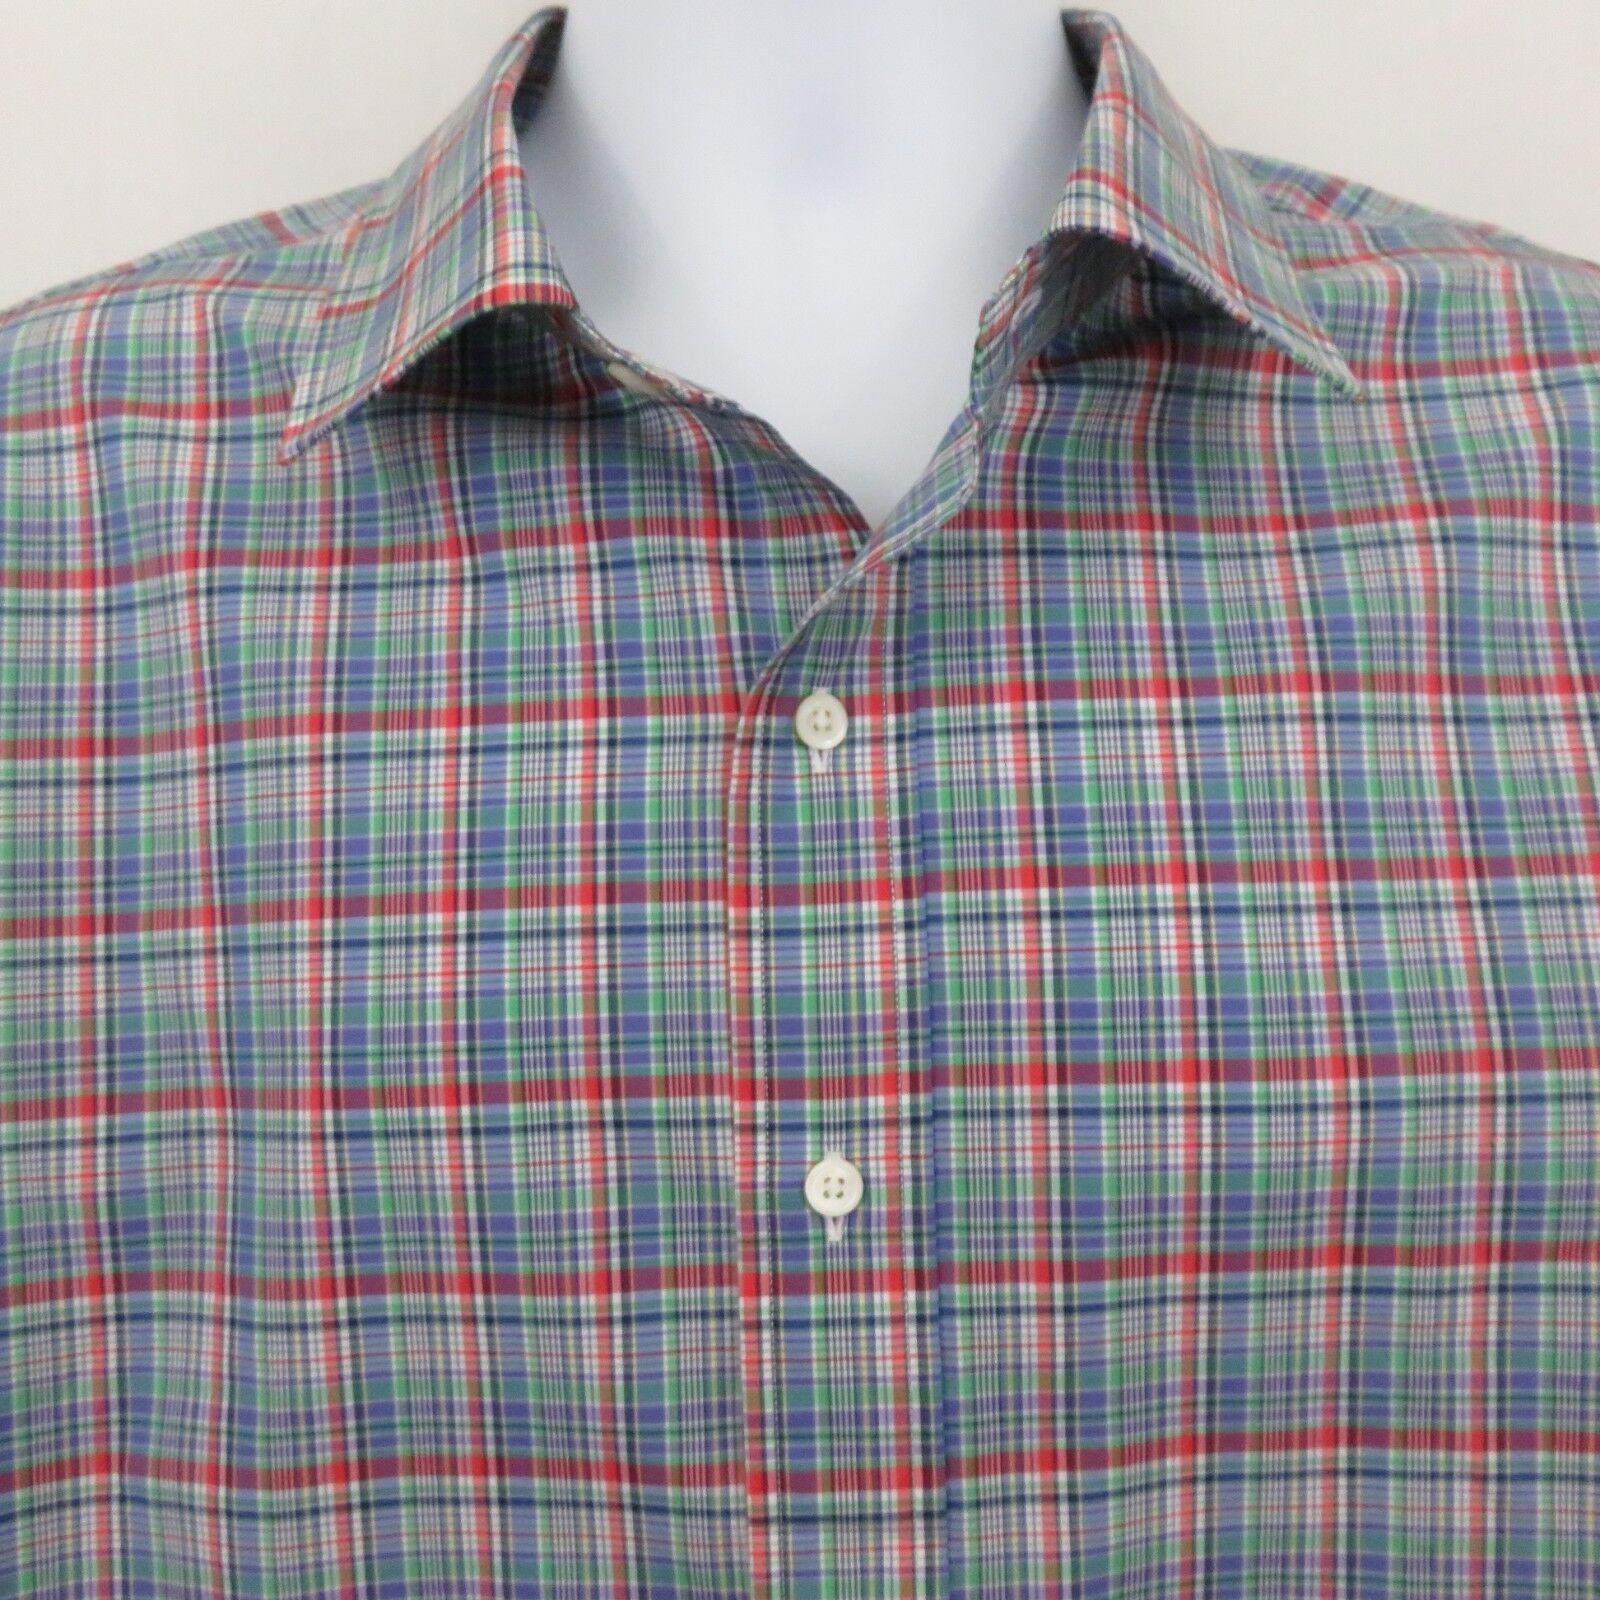 Polo Ralph Lauren Red Purple Green Plaid Mens XXL Shirt Long Sleeve 100% Cotton